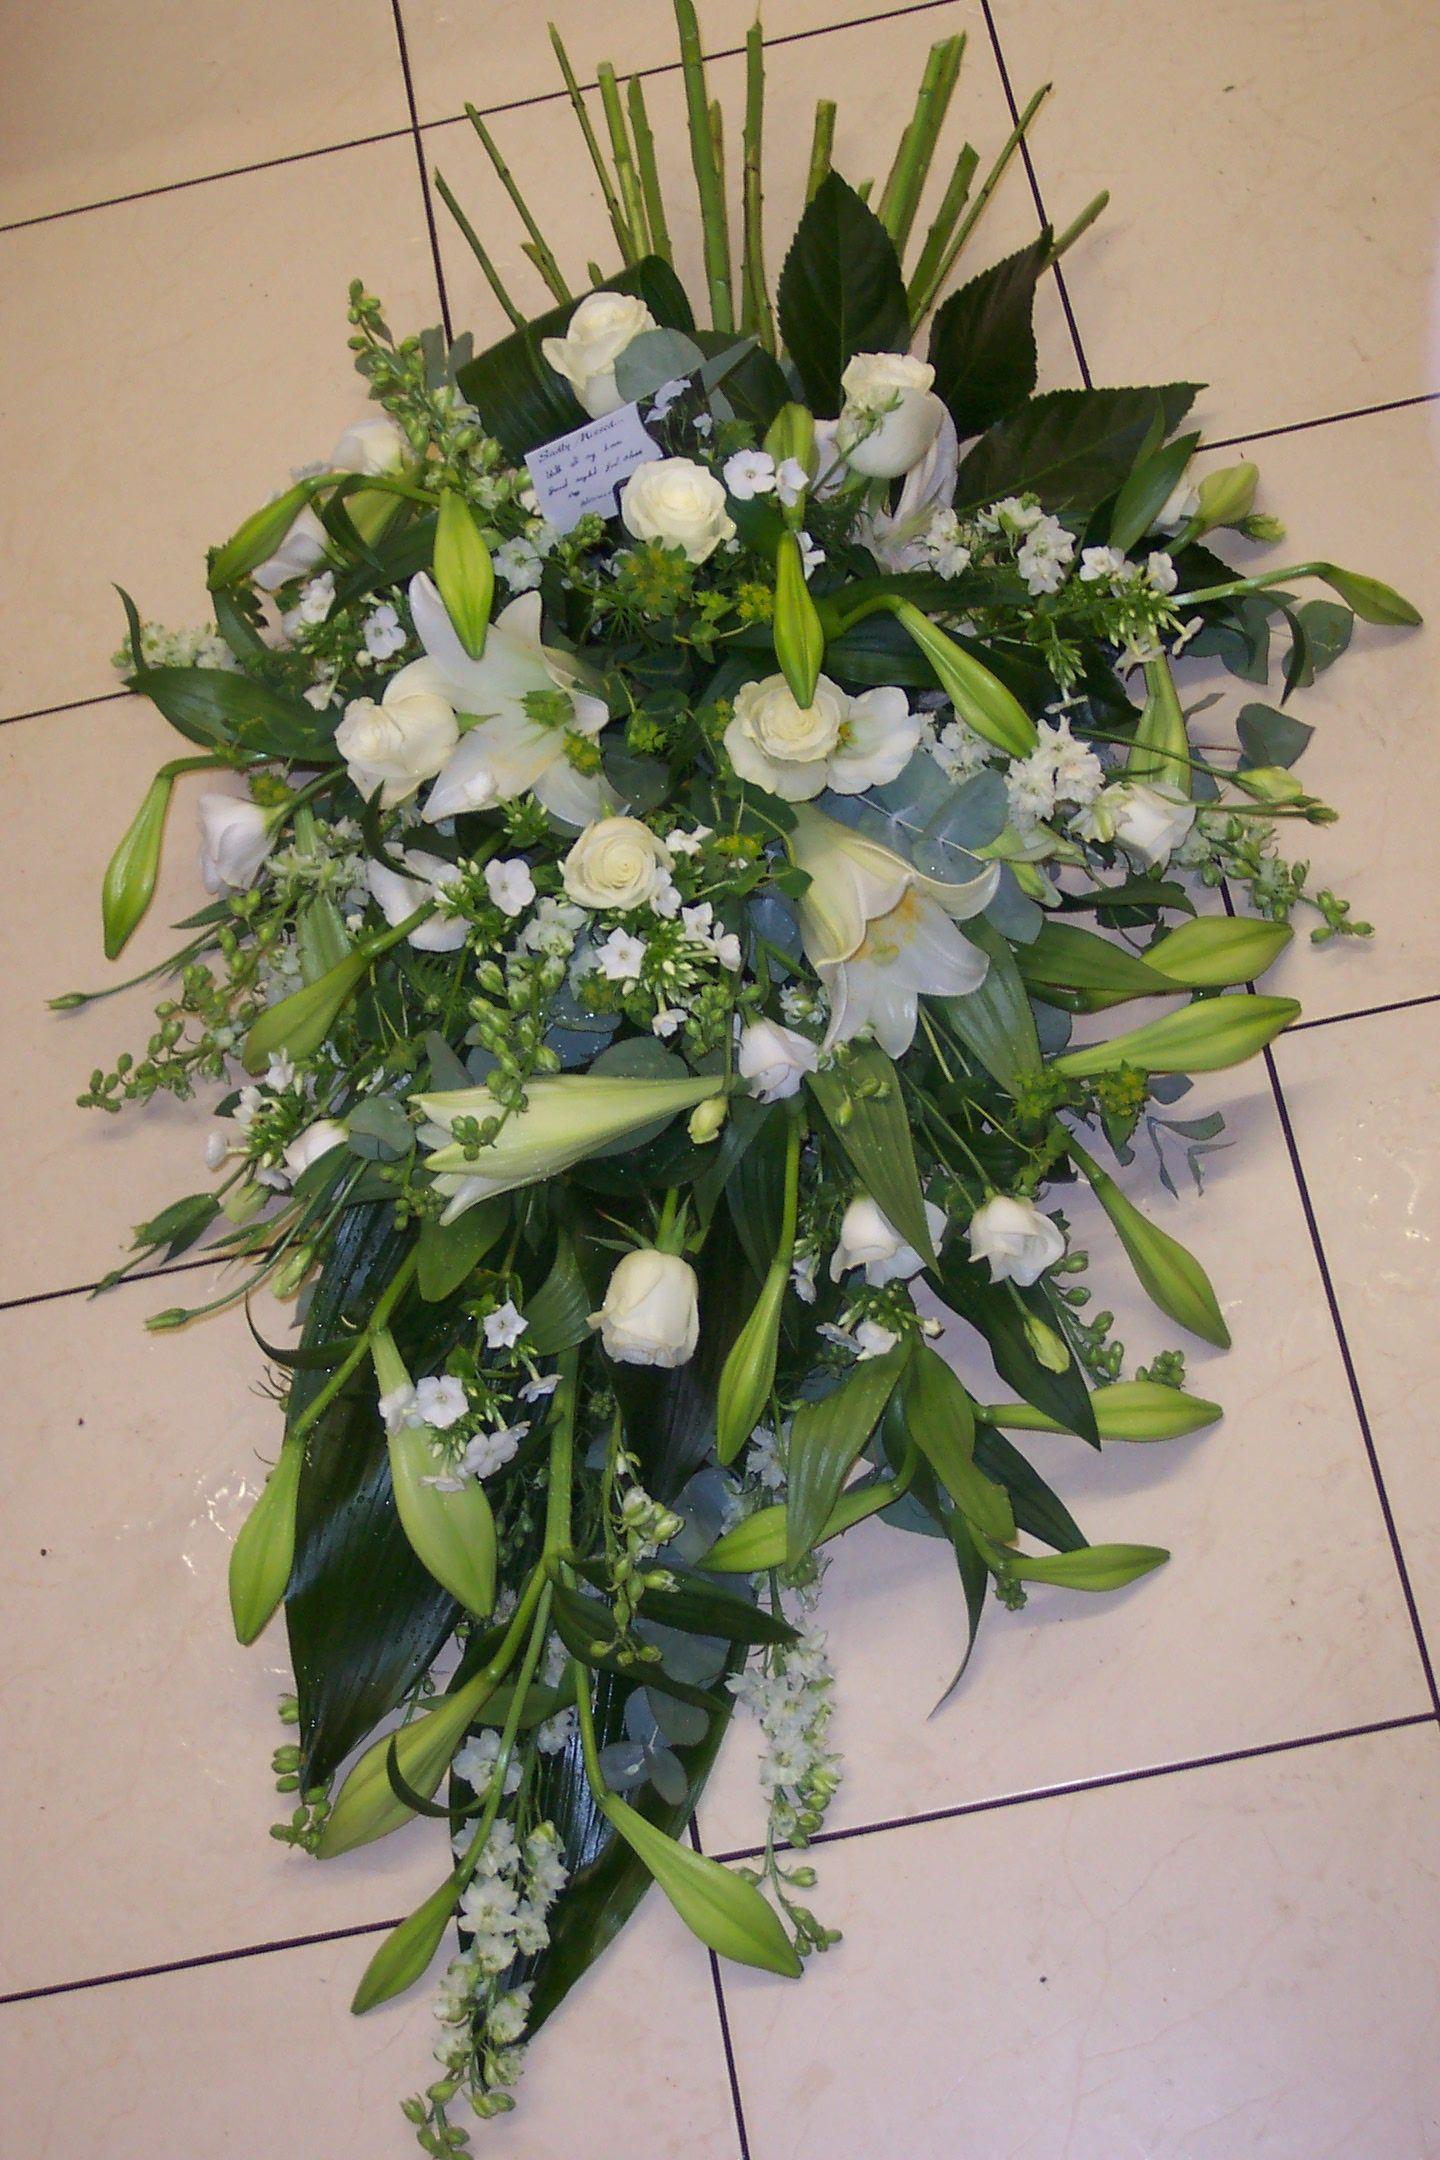 Elegant Funeral Flowers Funeral Floral Designs Pinterest